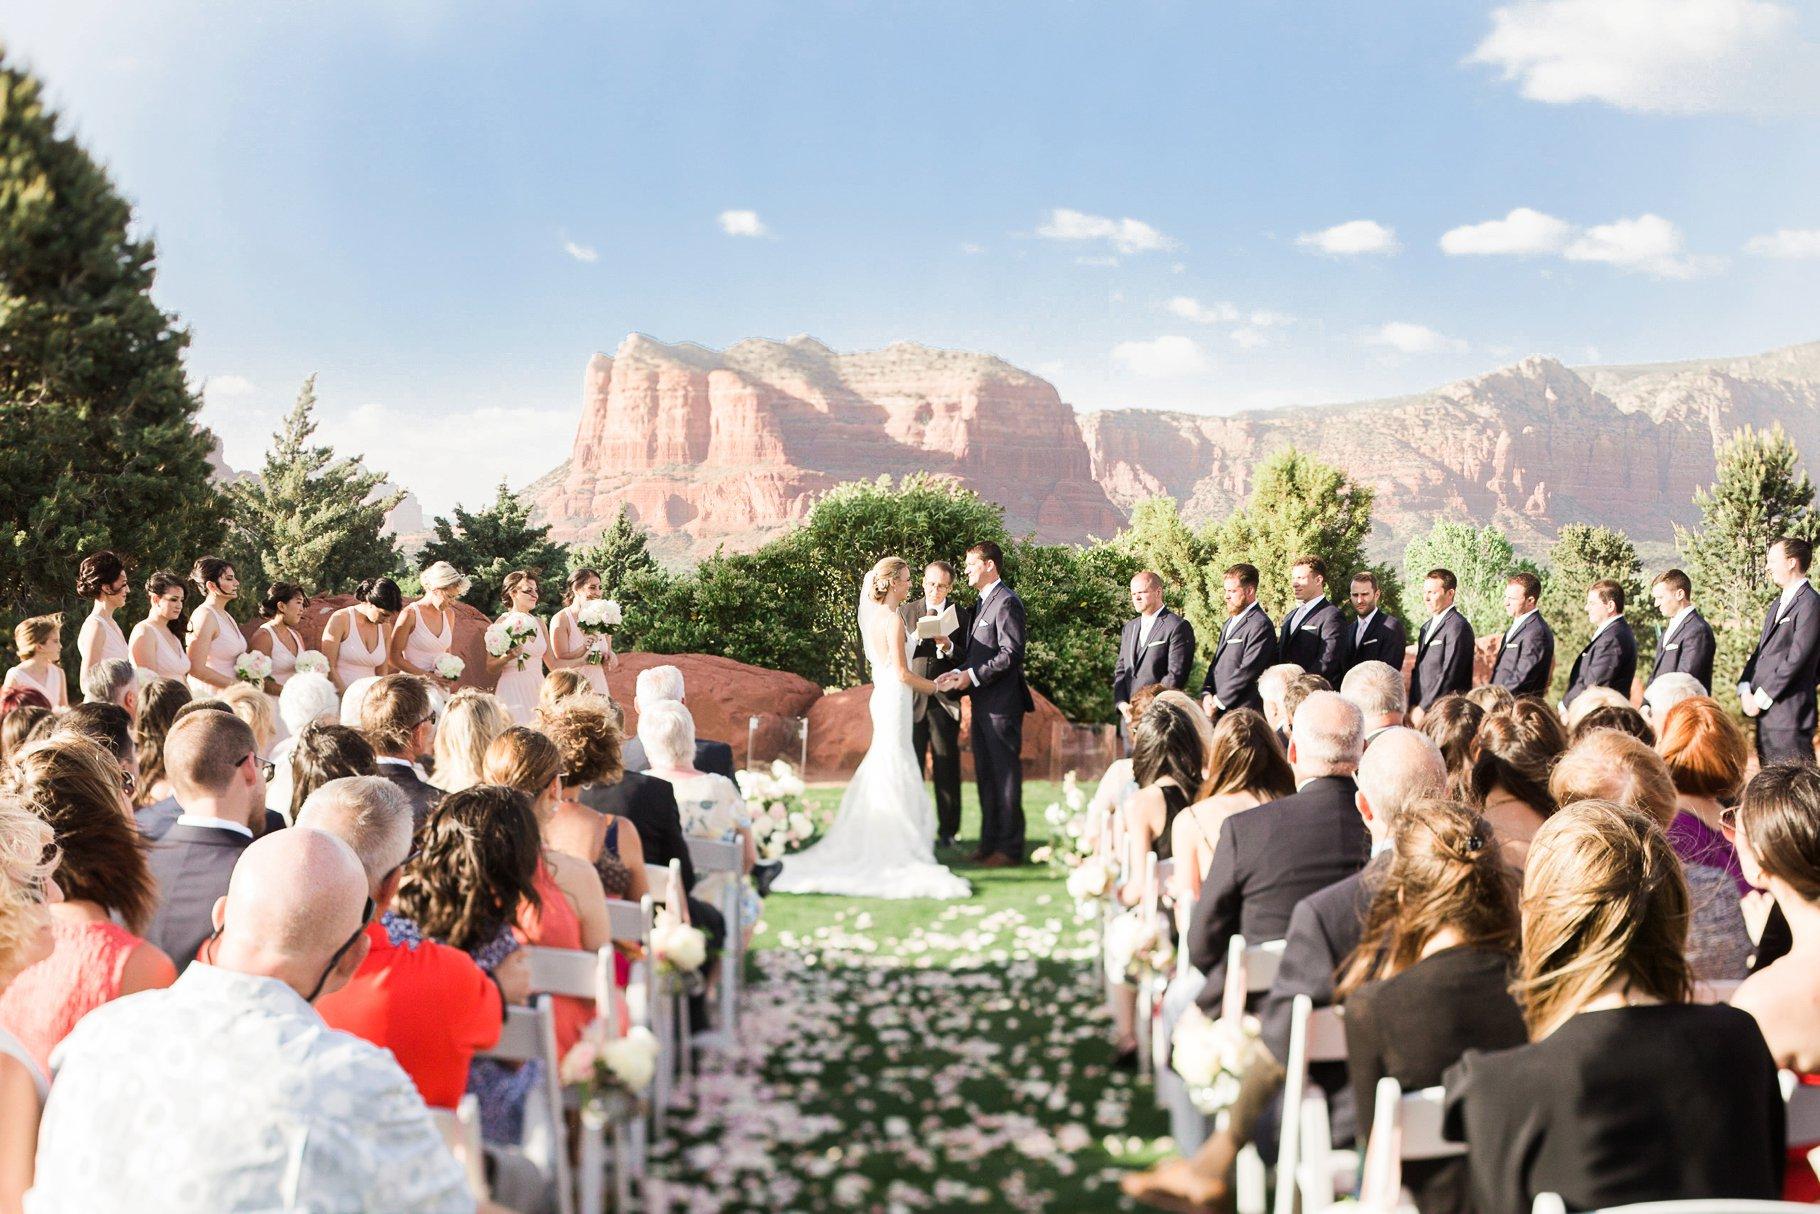 Outdoor wedding at Sedona Golf Resort